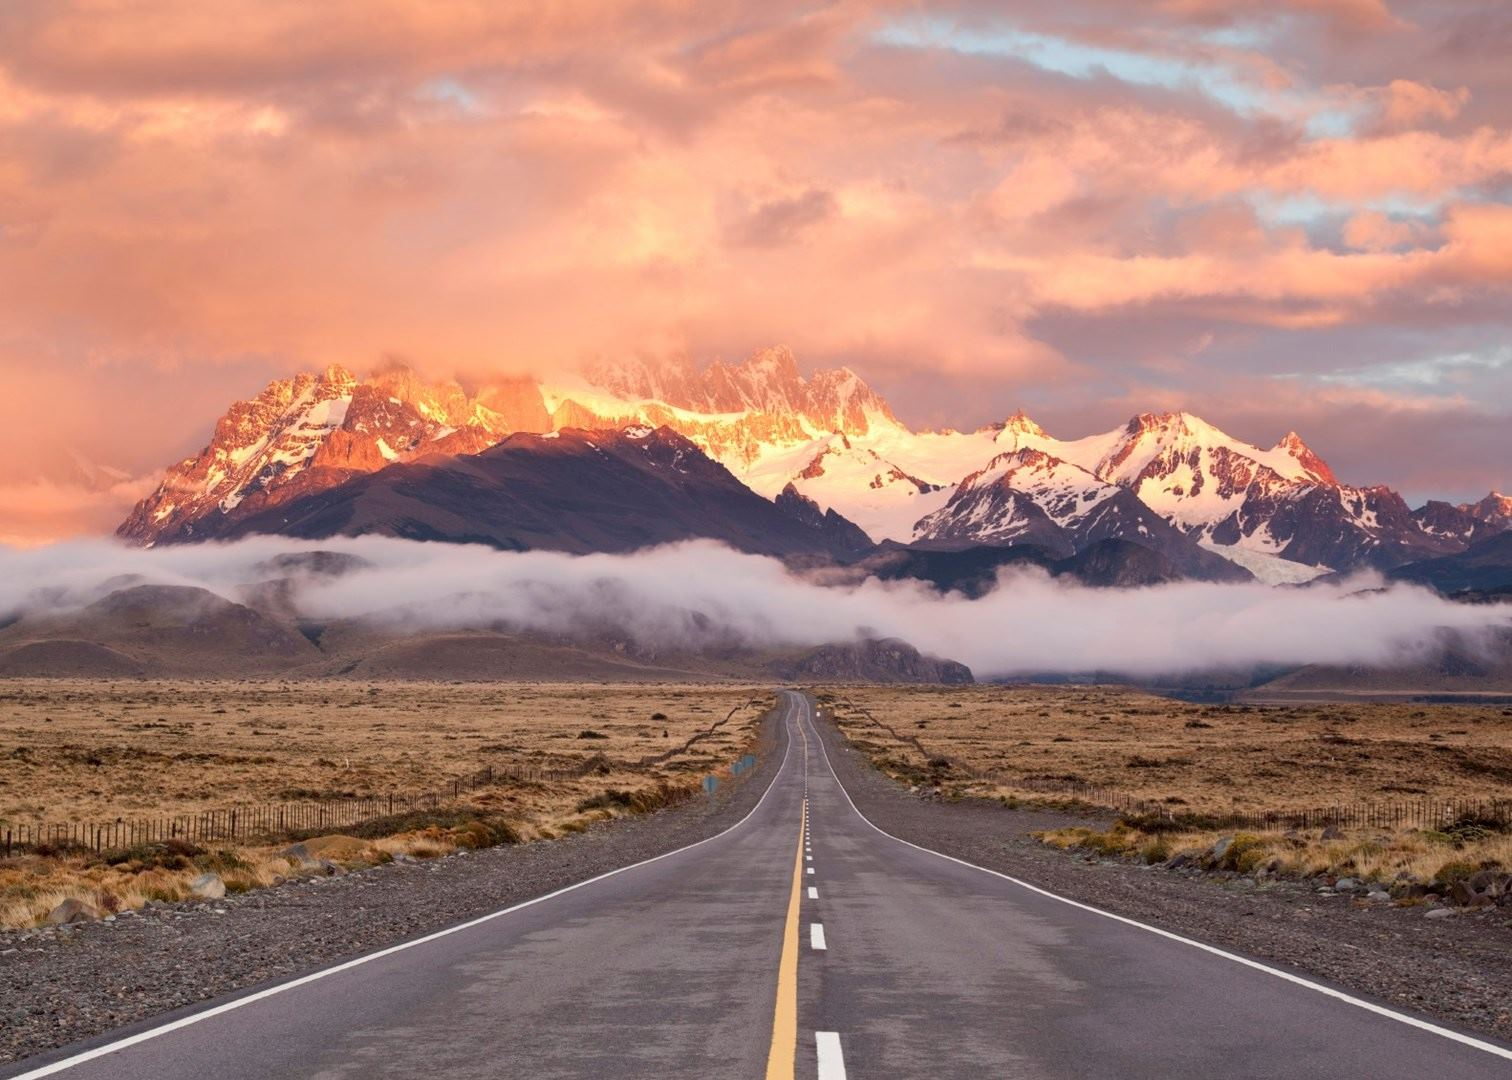 Visit El Chalten on a trip to Argentina | Audley Travel